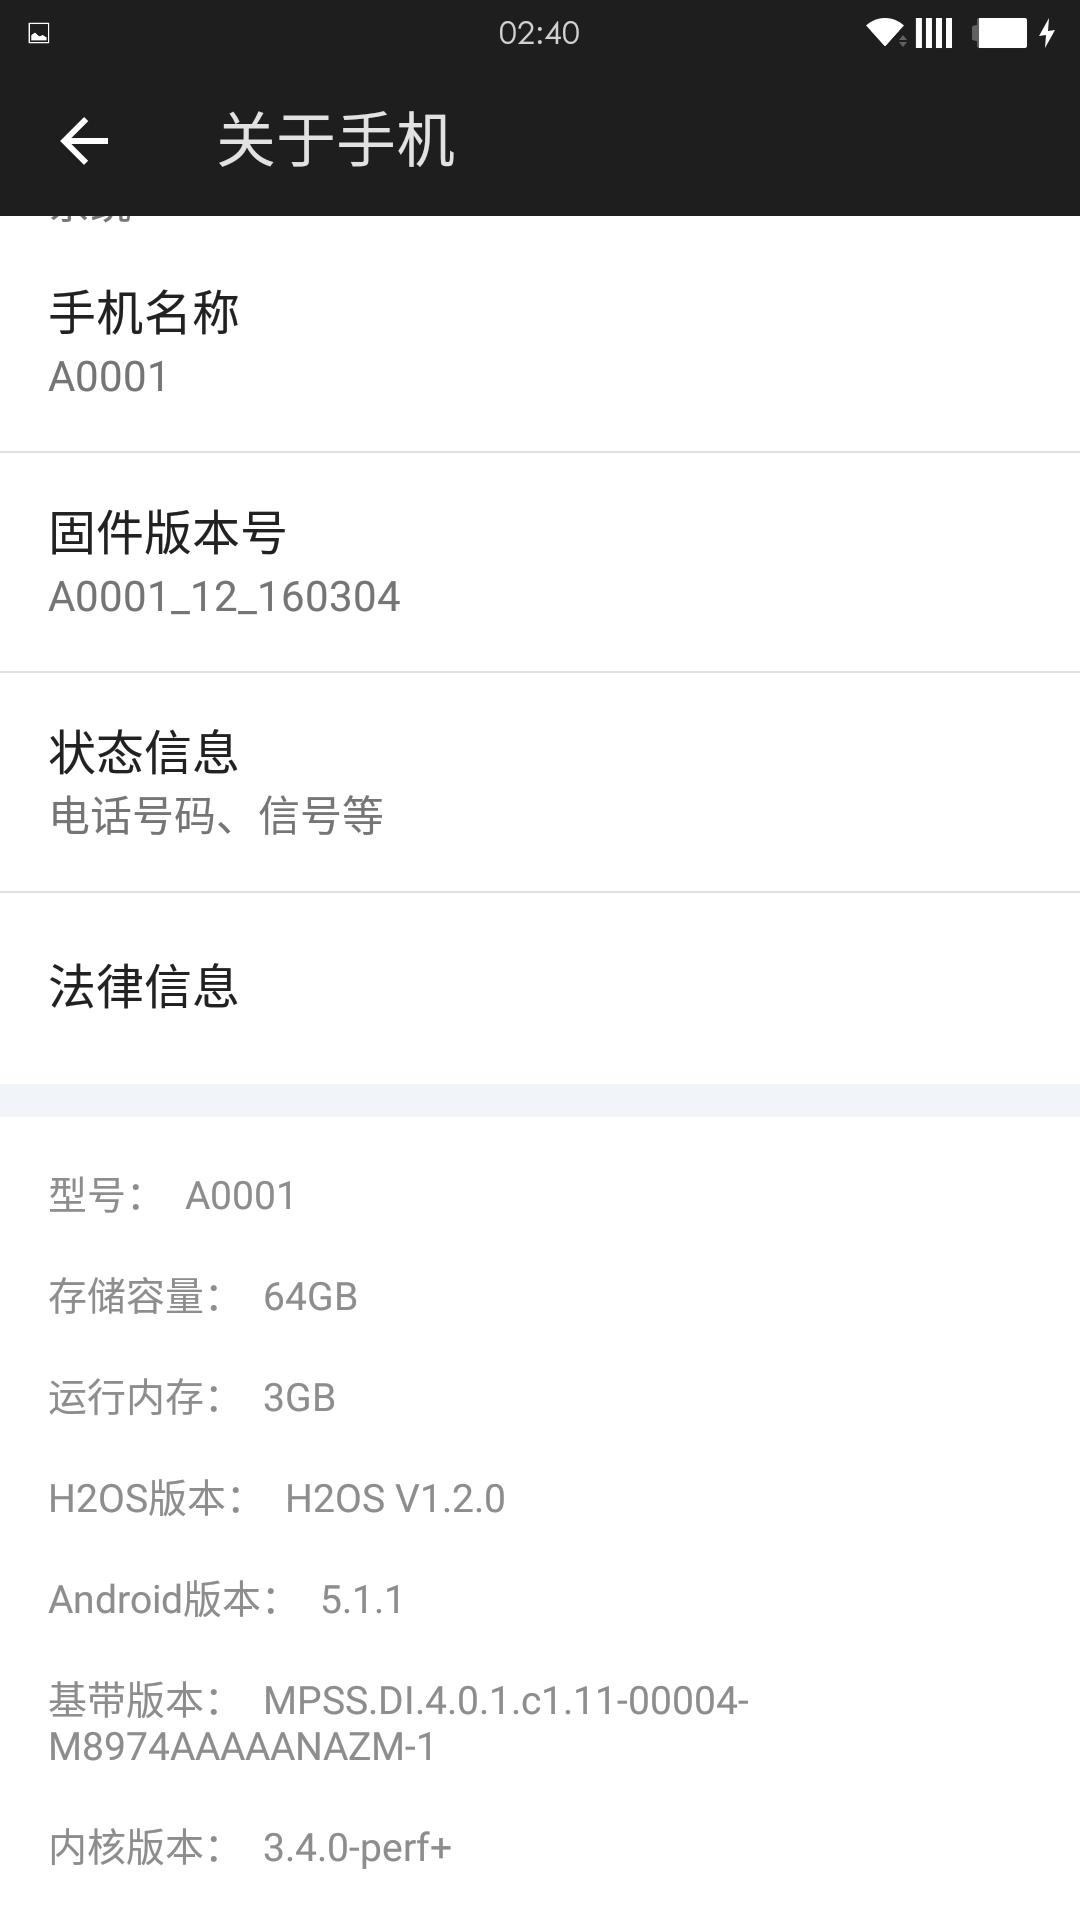 H2OS V1.2安卓5.1.1